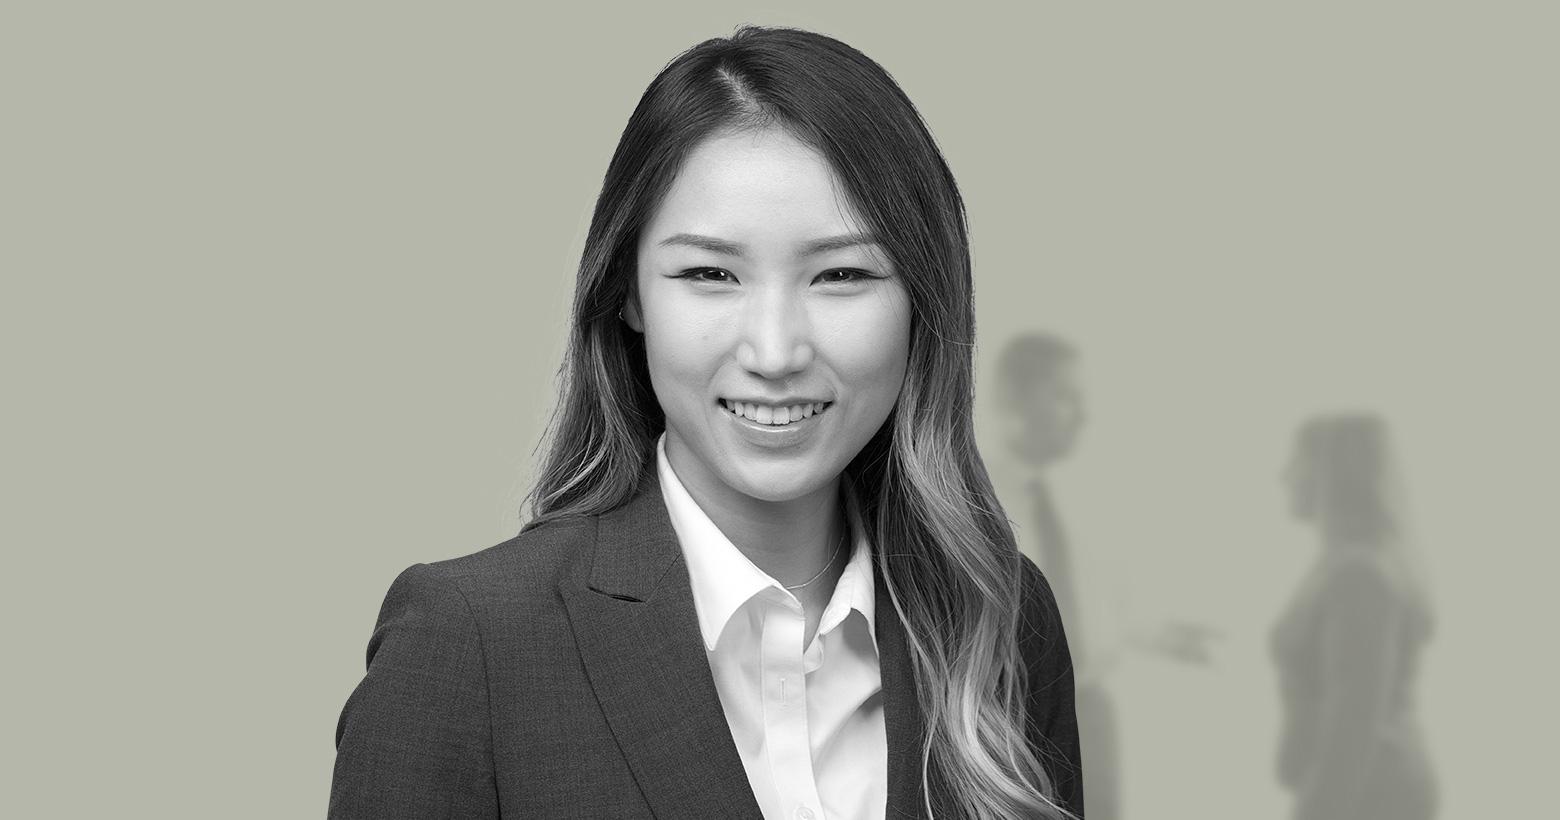 Hyo Min Kim